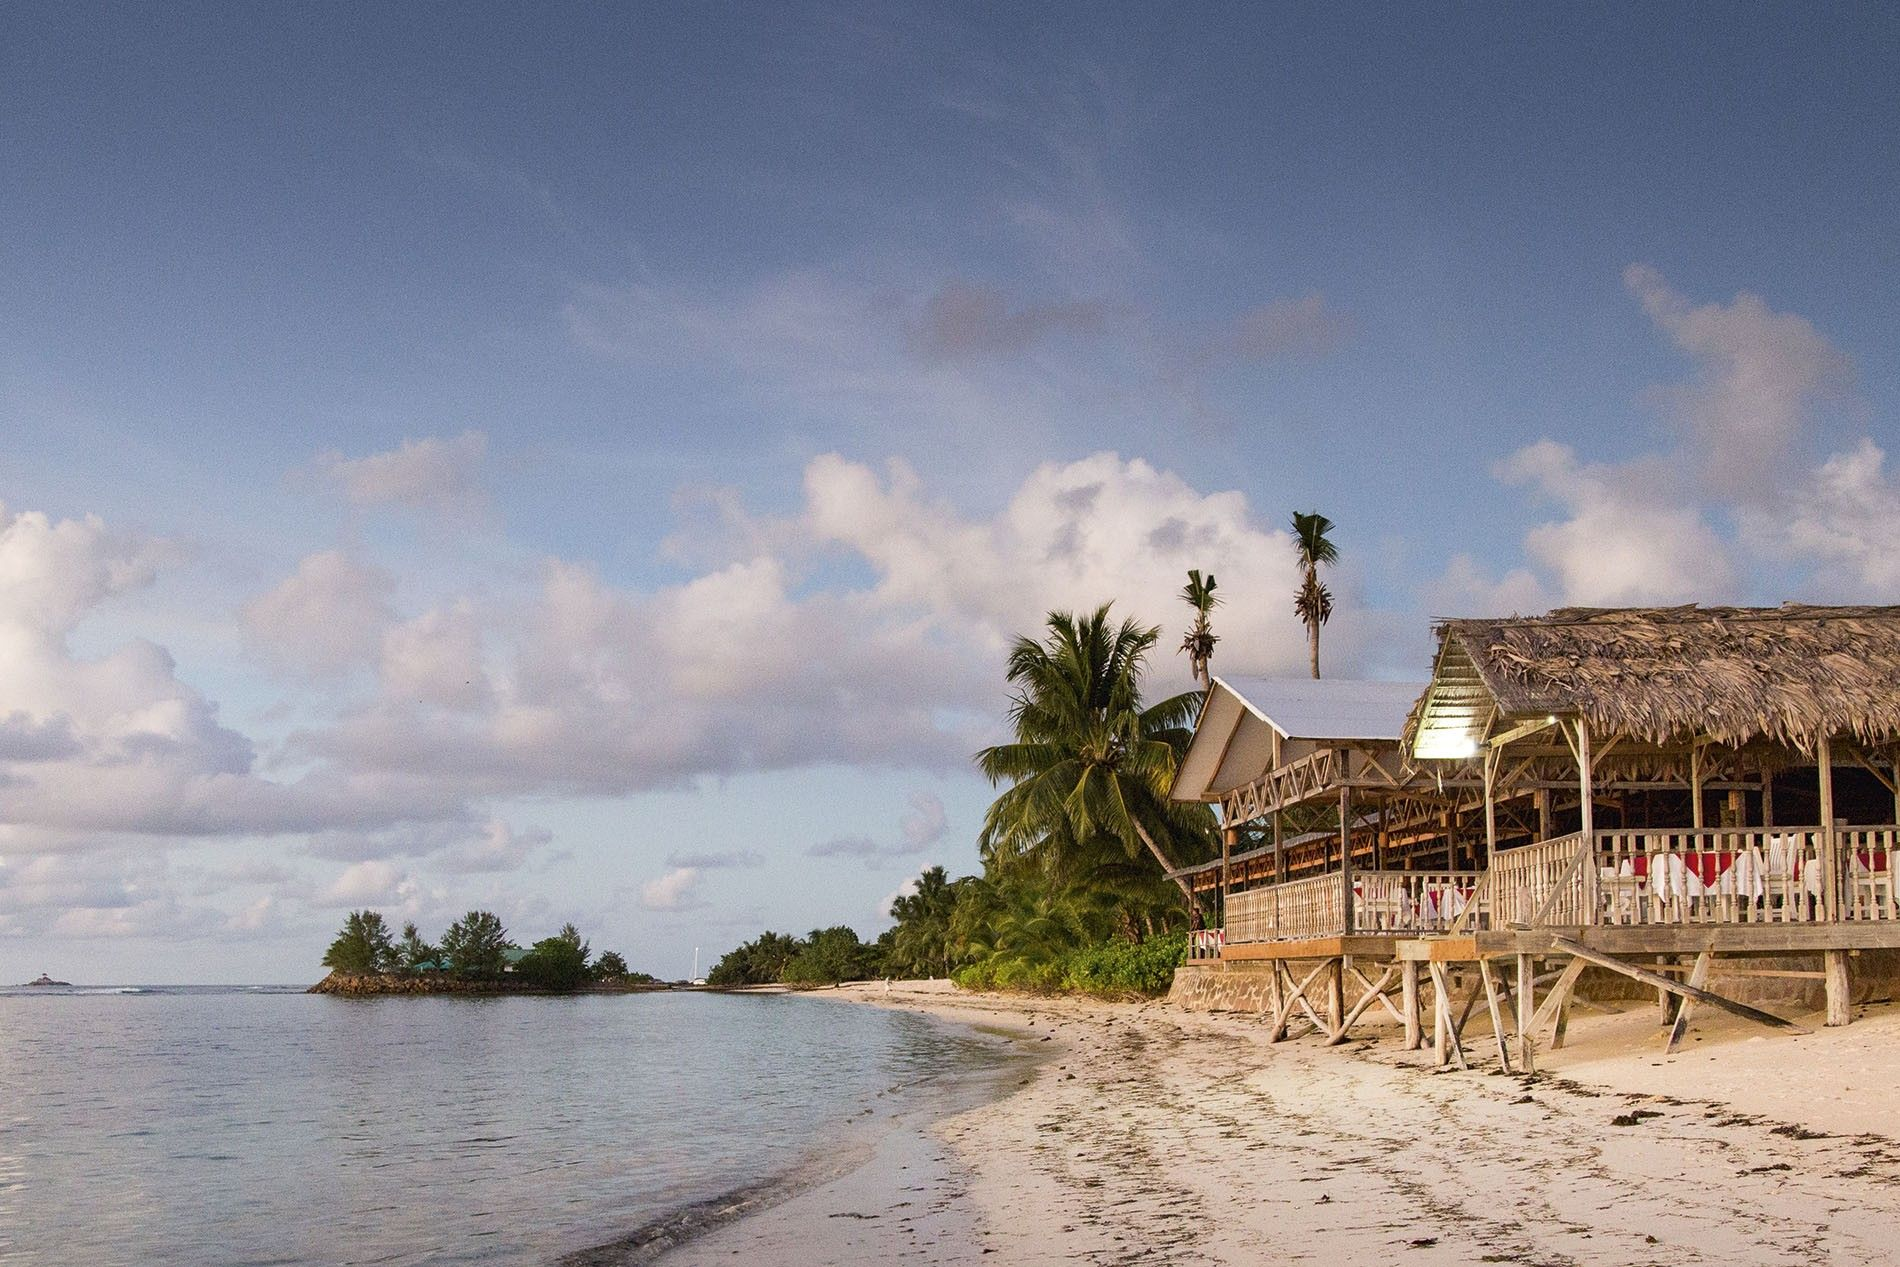 Beach huts on the Seychelles island of La Digue